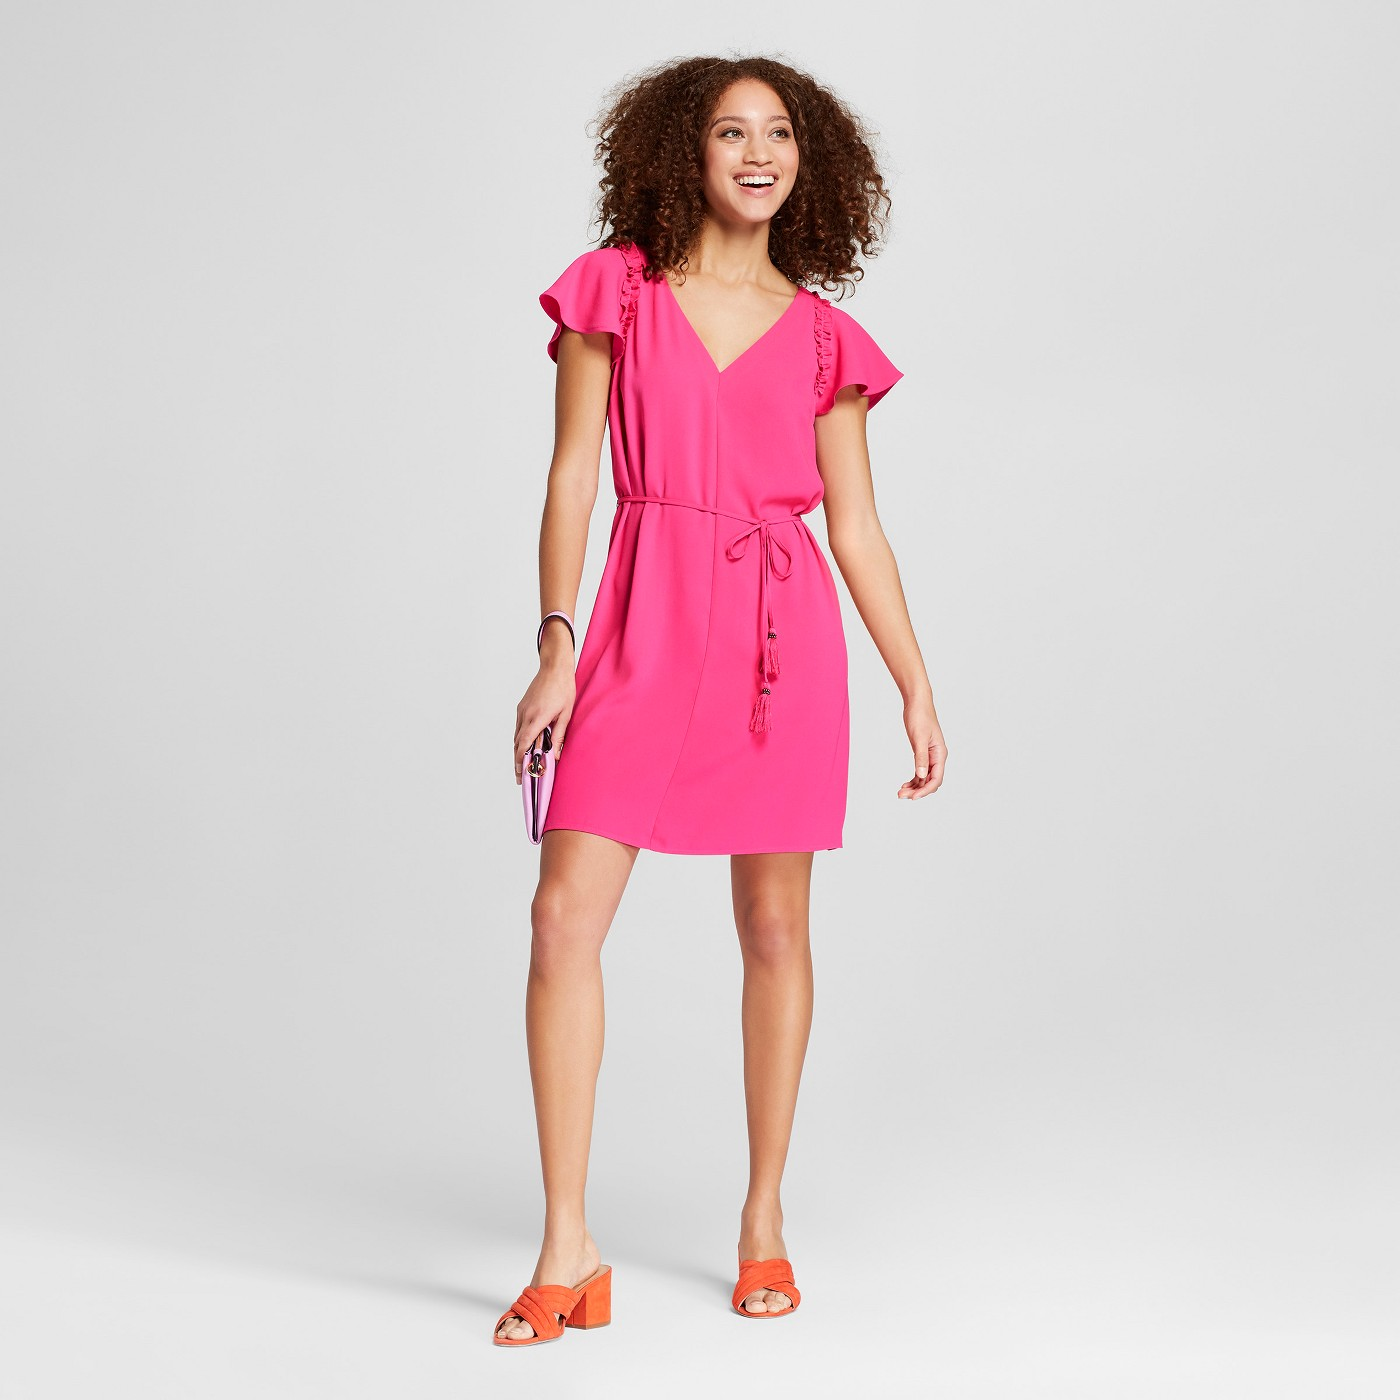 "Women's Ruffle Sleeve Crepe Dress - A New Dayâ""¢ Pink - image 1 of 3"